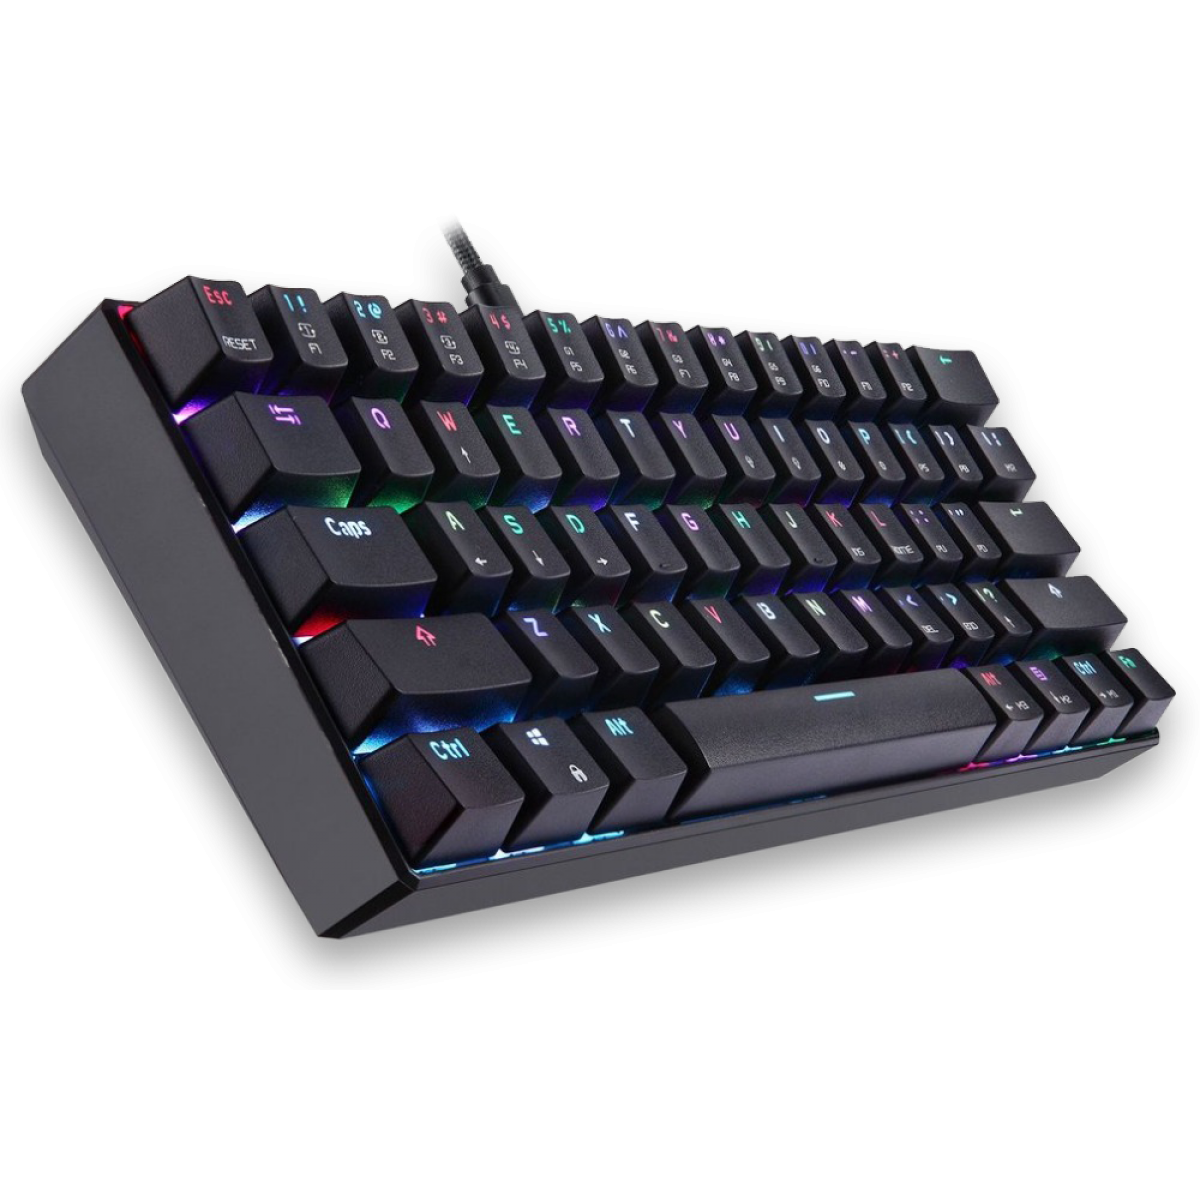 Teclado Mecânico Gamer Motospeed CK61 Essential, RGB, Switch vermelho, Preto, FMSTC0091VEM